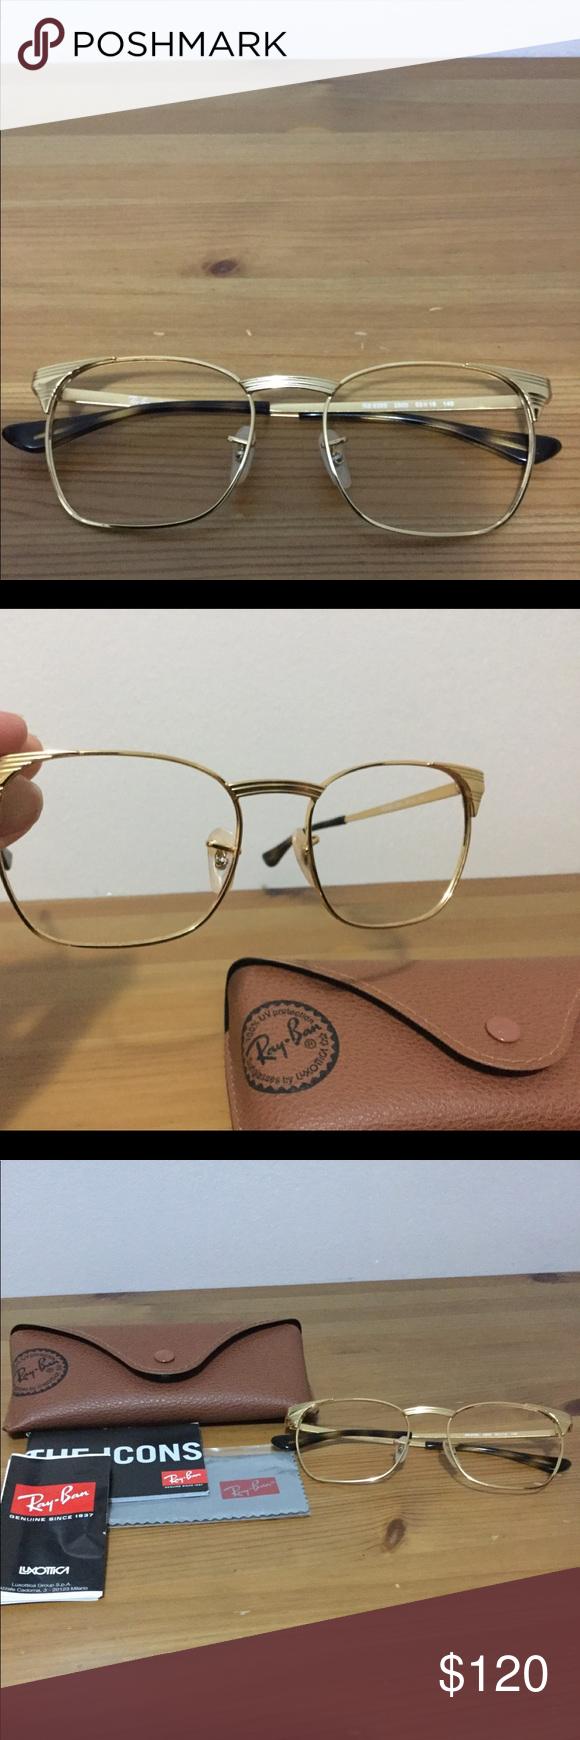 a2486a8fc9310 Ray-Ban Optic Club Master Glasses Ray Ban Signet Optic Club Master Glasses  in metal